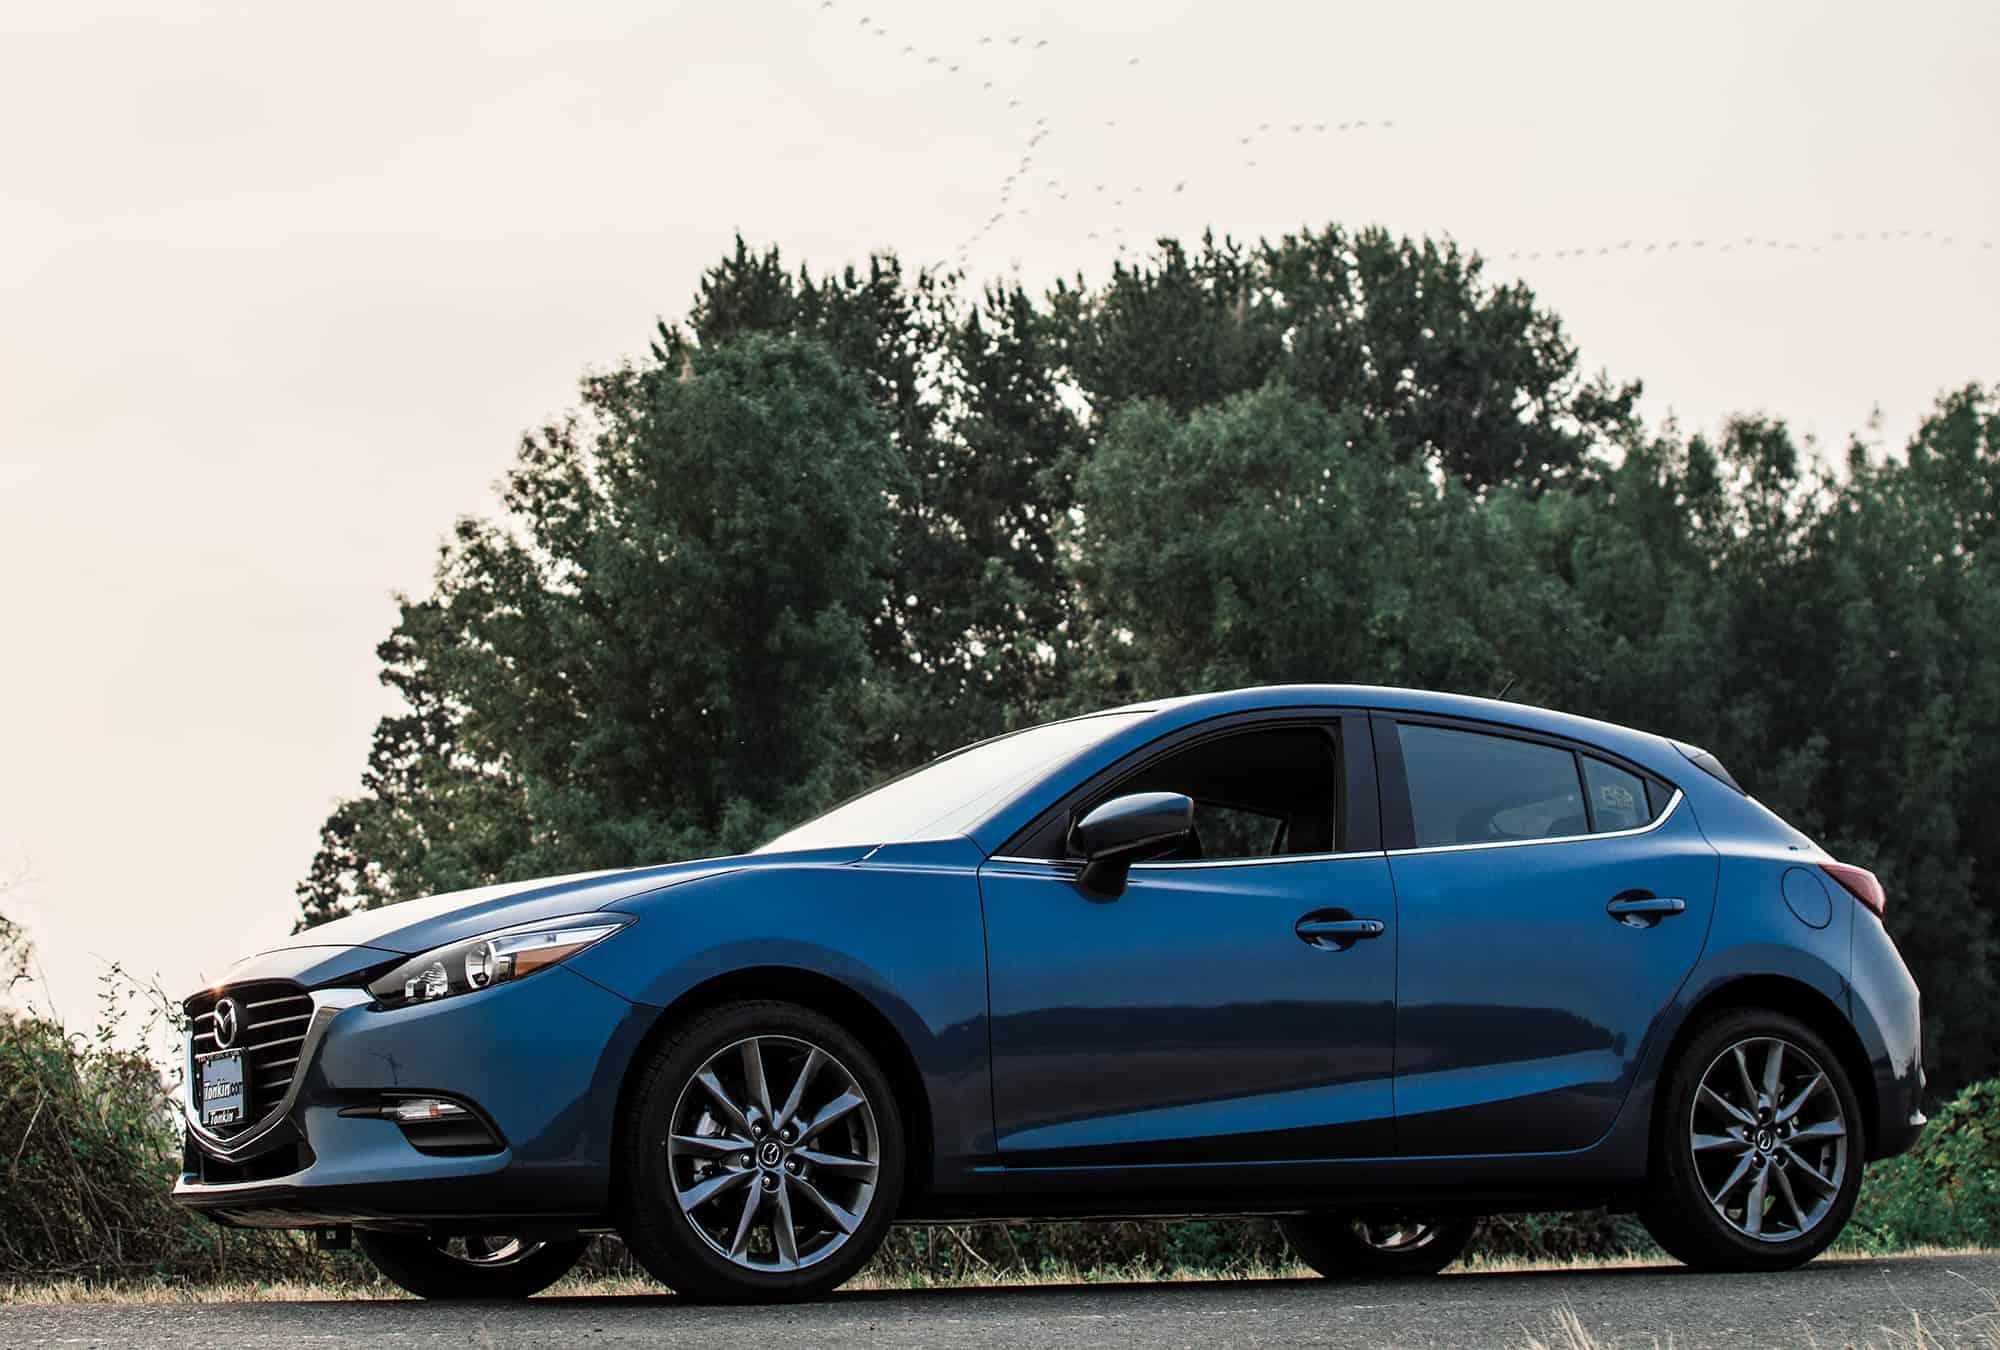 Mazda 3 Service Manual: Non Return Valve Inspection Mzr 2.3 Disi Turbo